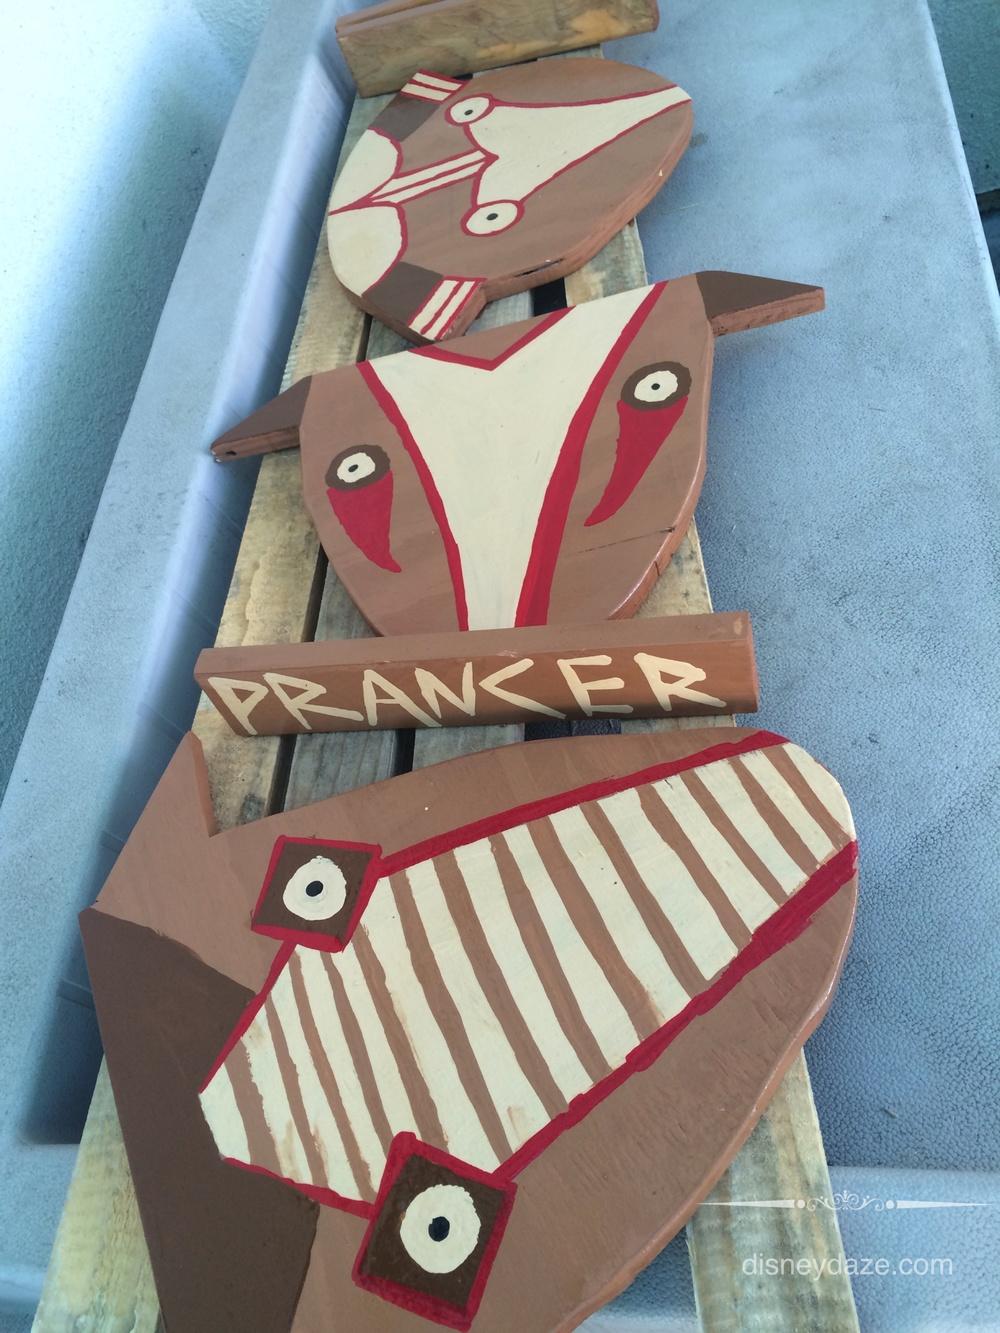 Disneyland Inspired Christmas Decorations: Part 2 - Tiki Reindeers ...